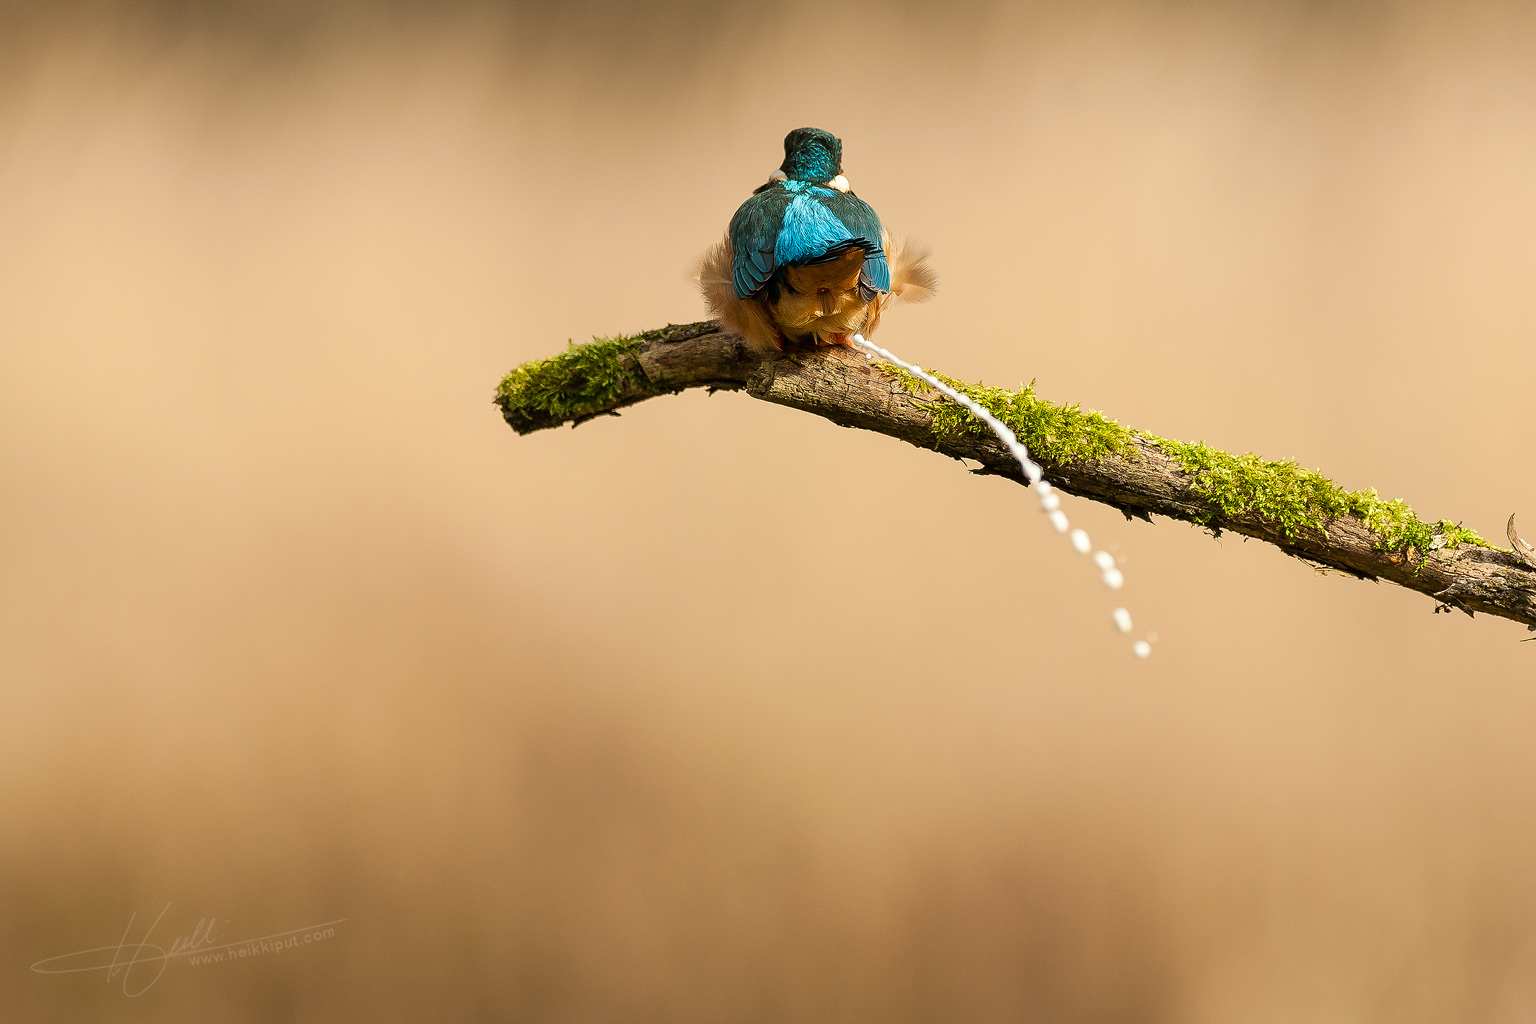 Excrementing Kingfisher  (Alcedo atthis)  on HeikkiPut.com - Nature & Wildlife Photography